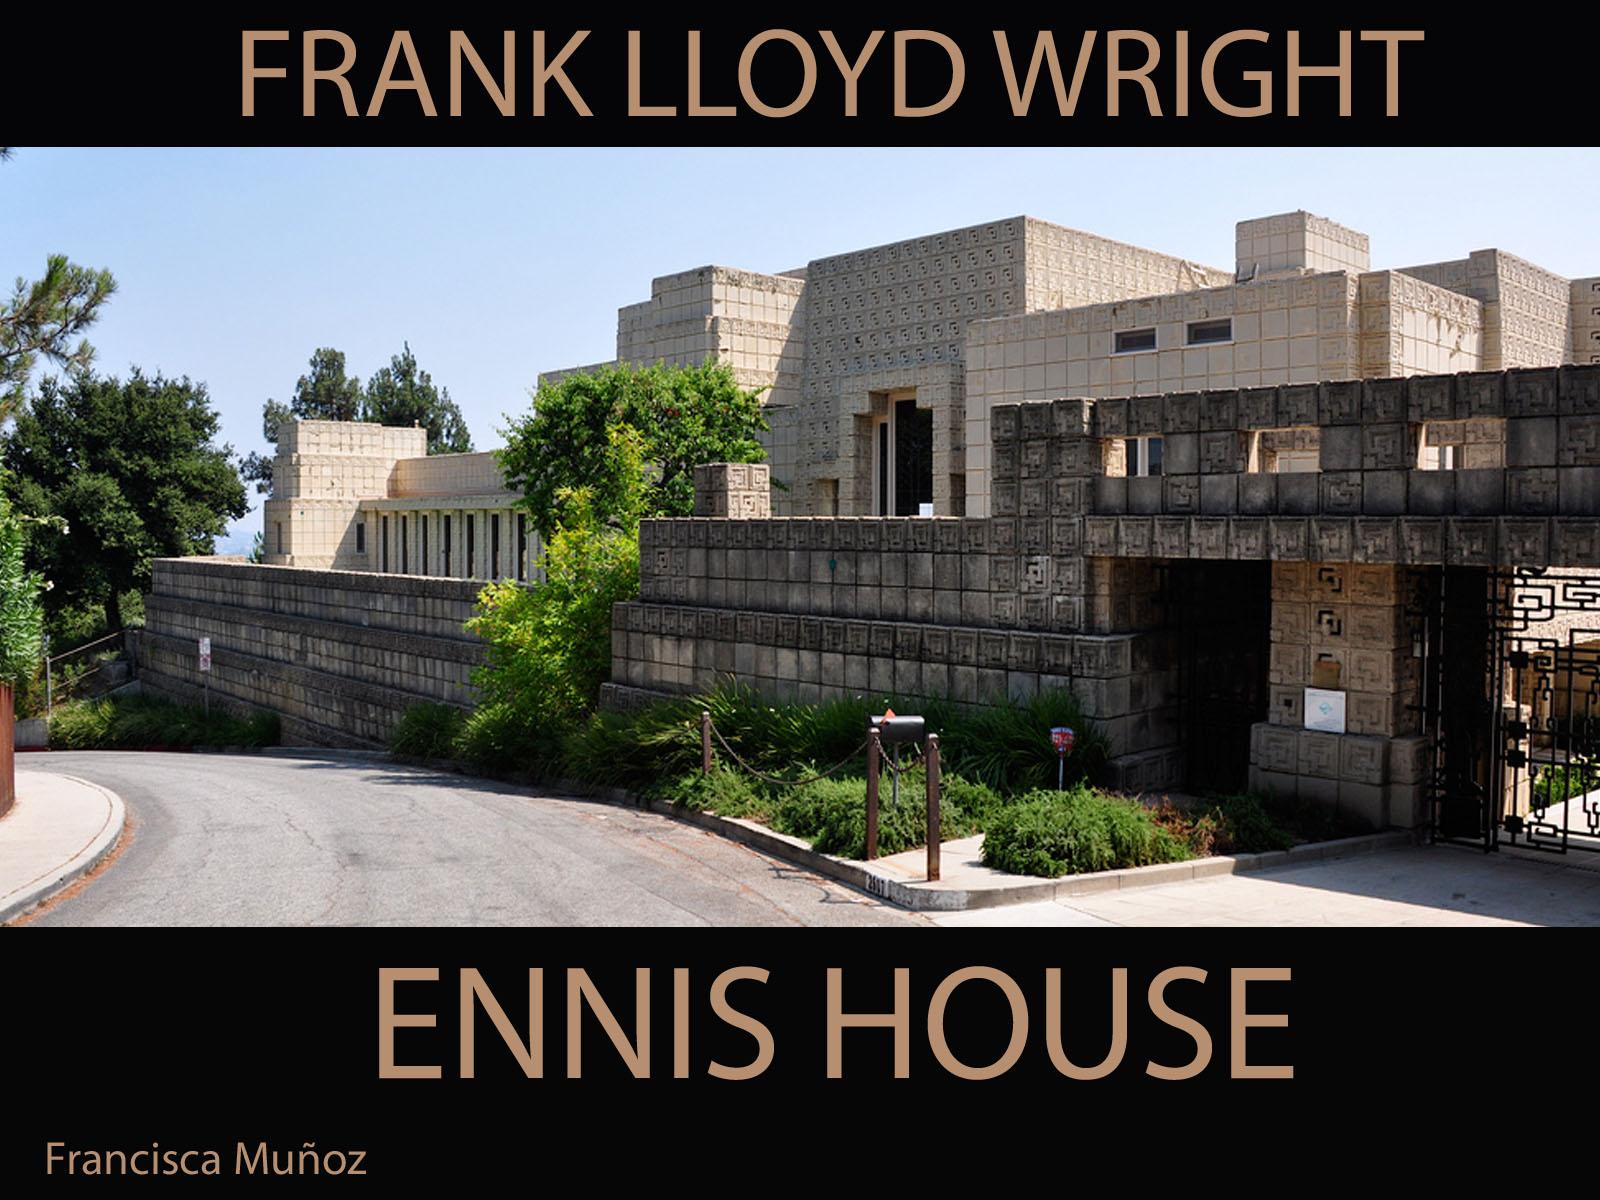 Taller Composicion Plastica UDD  seccion 4 Ennis House  Frank Lloyd Wright